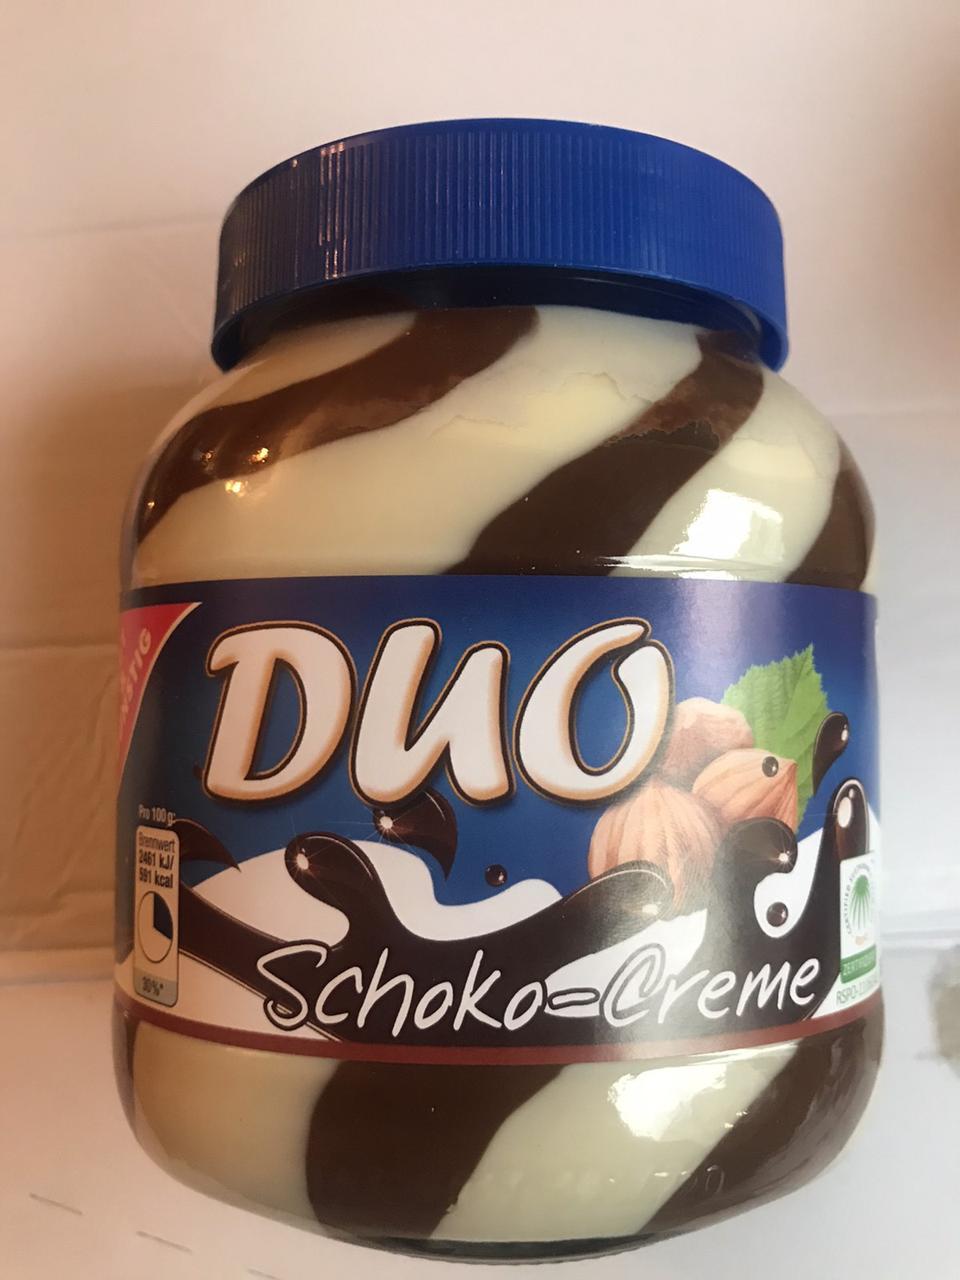 Шоколадная паста Duo Choco - Creme 750g